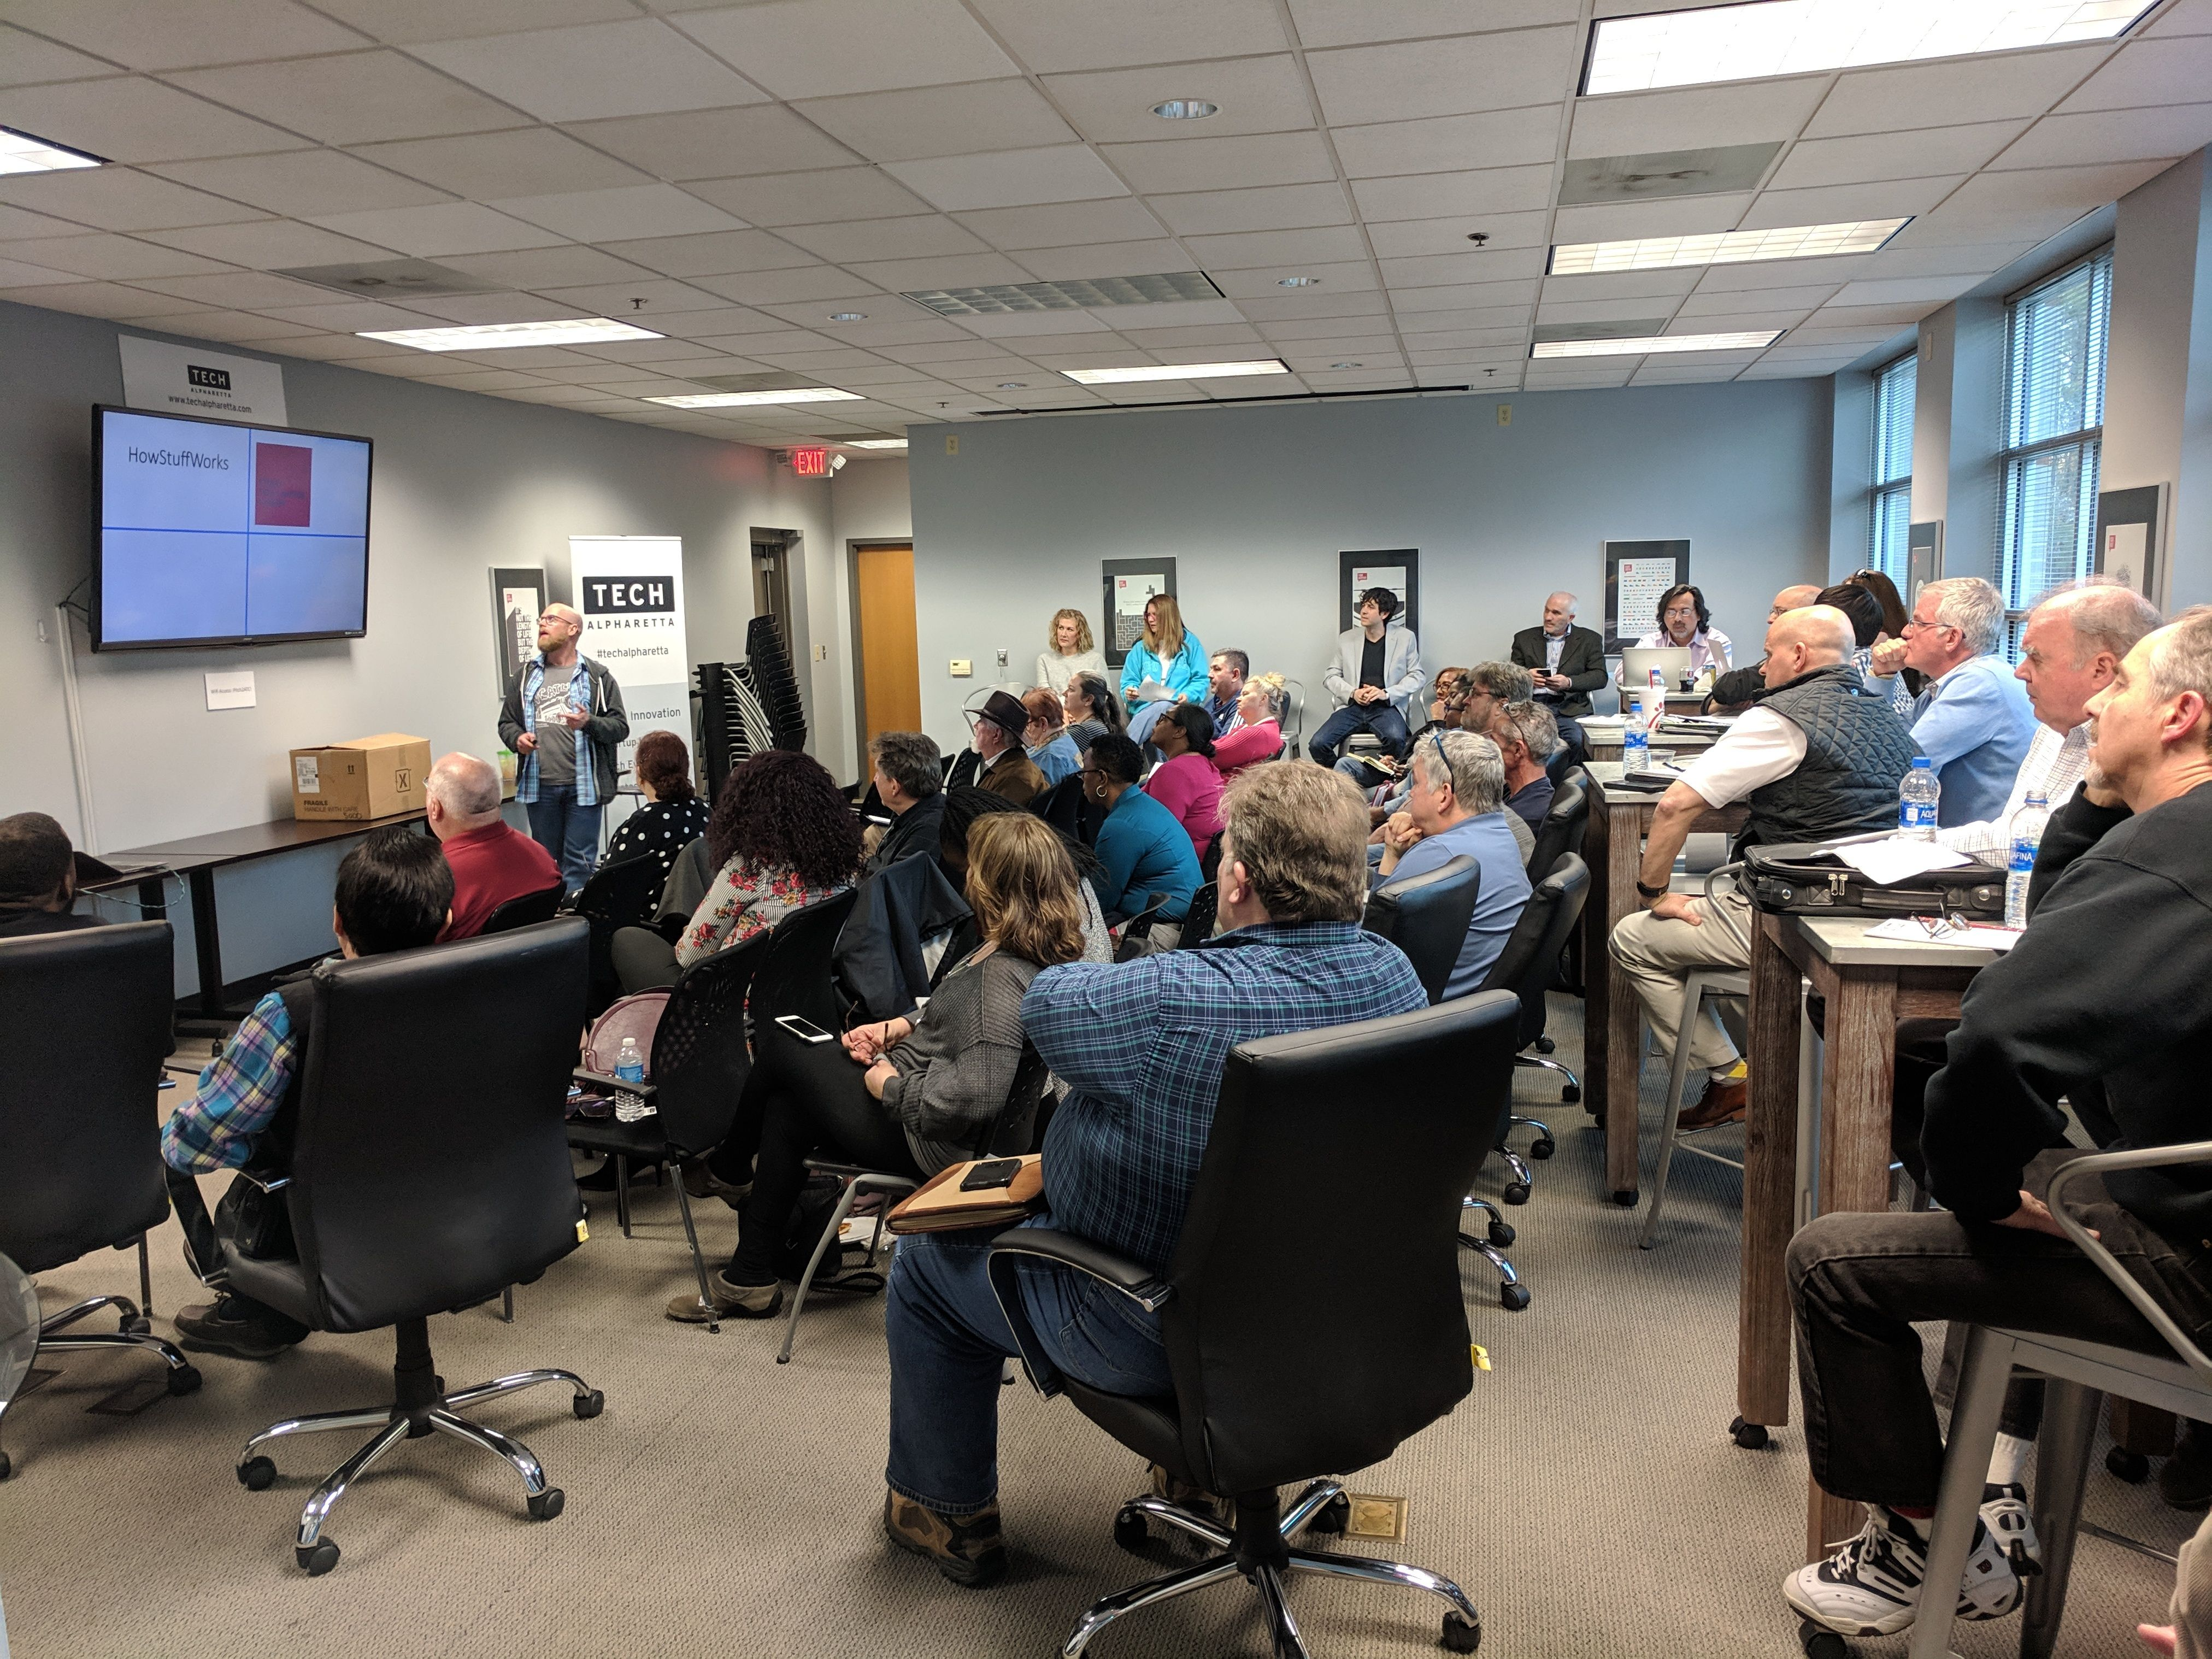 North Fulton WordPress Meetup